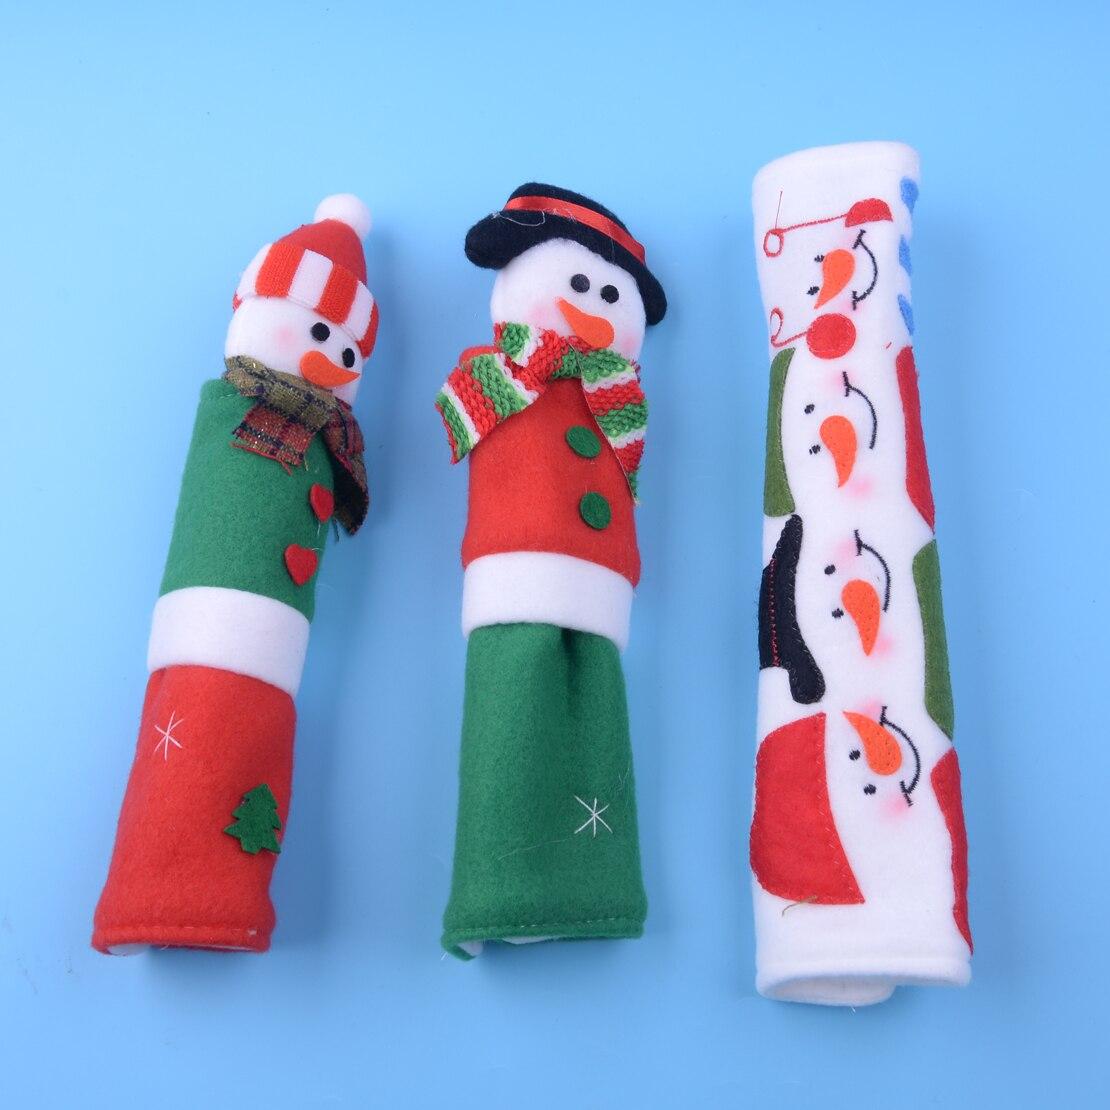 3PCSSET:  LETAOSK 3PCS/SET Christmas Xmas Snowman Santa Microwave Door Protective Refrigerator Handle Cover Kitchen Appliance Decoration - Martin's & Co